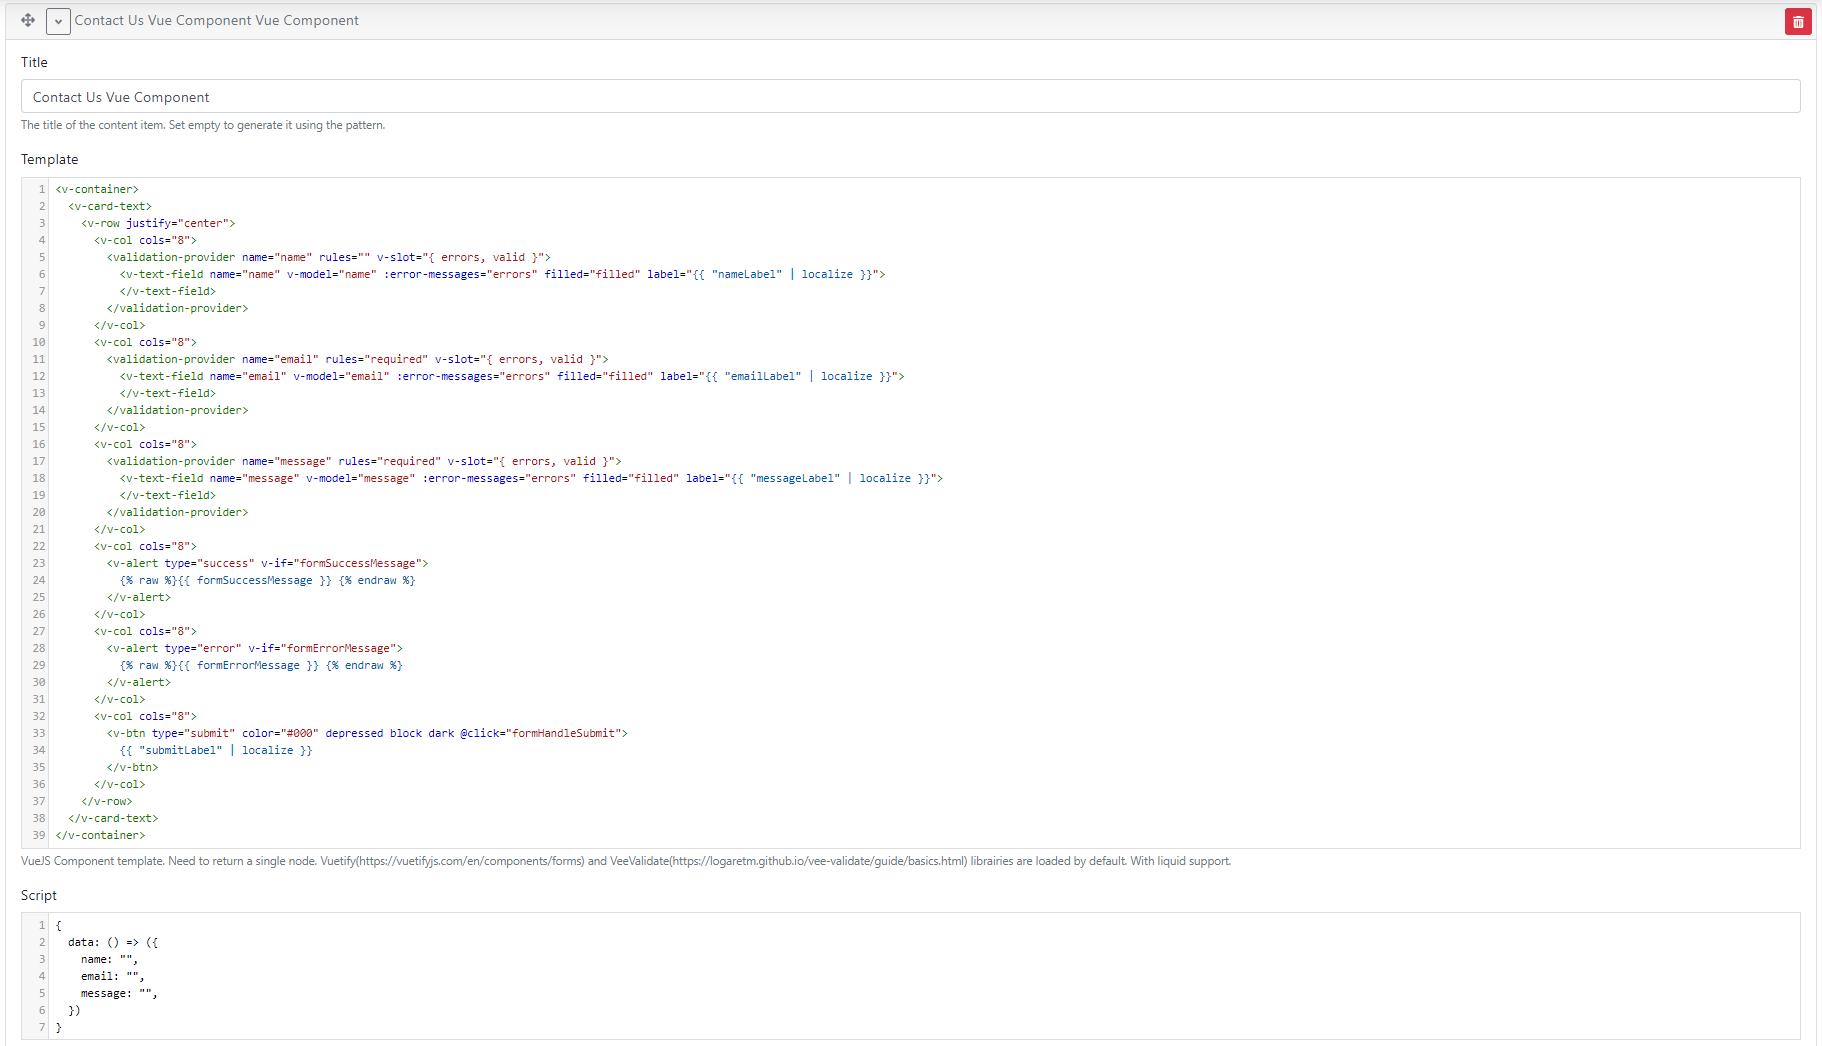 VueJS Component template